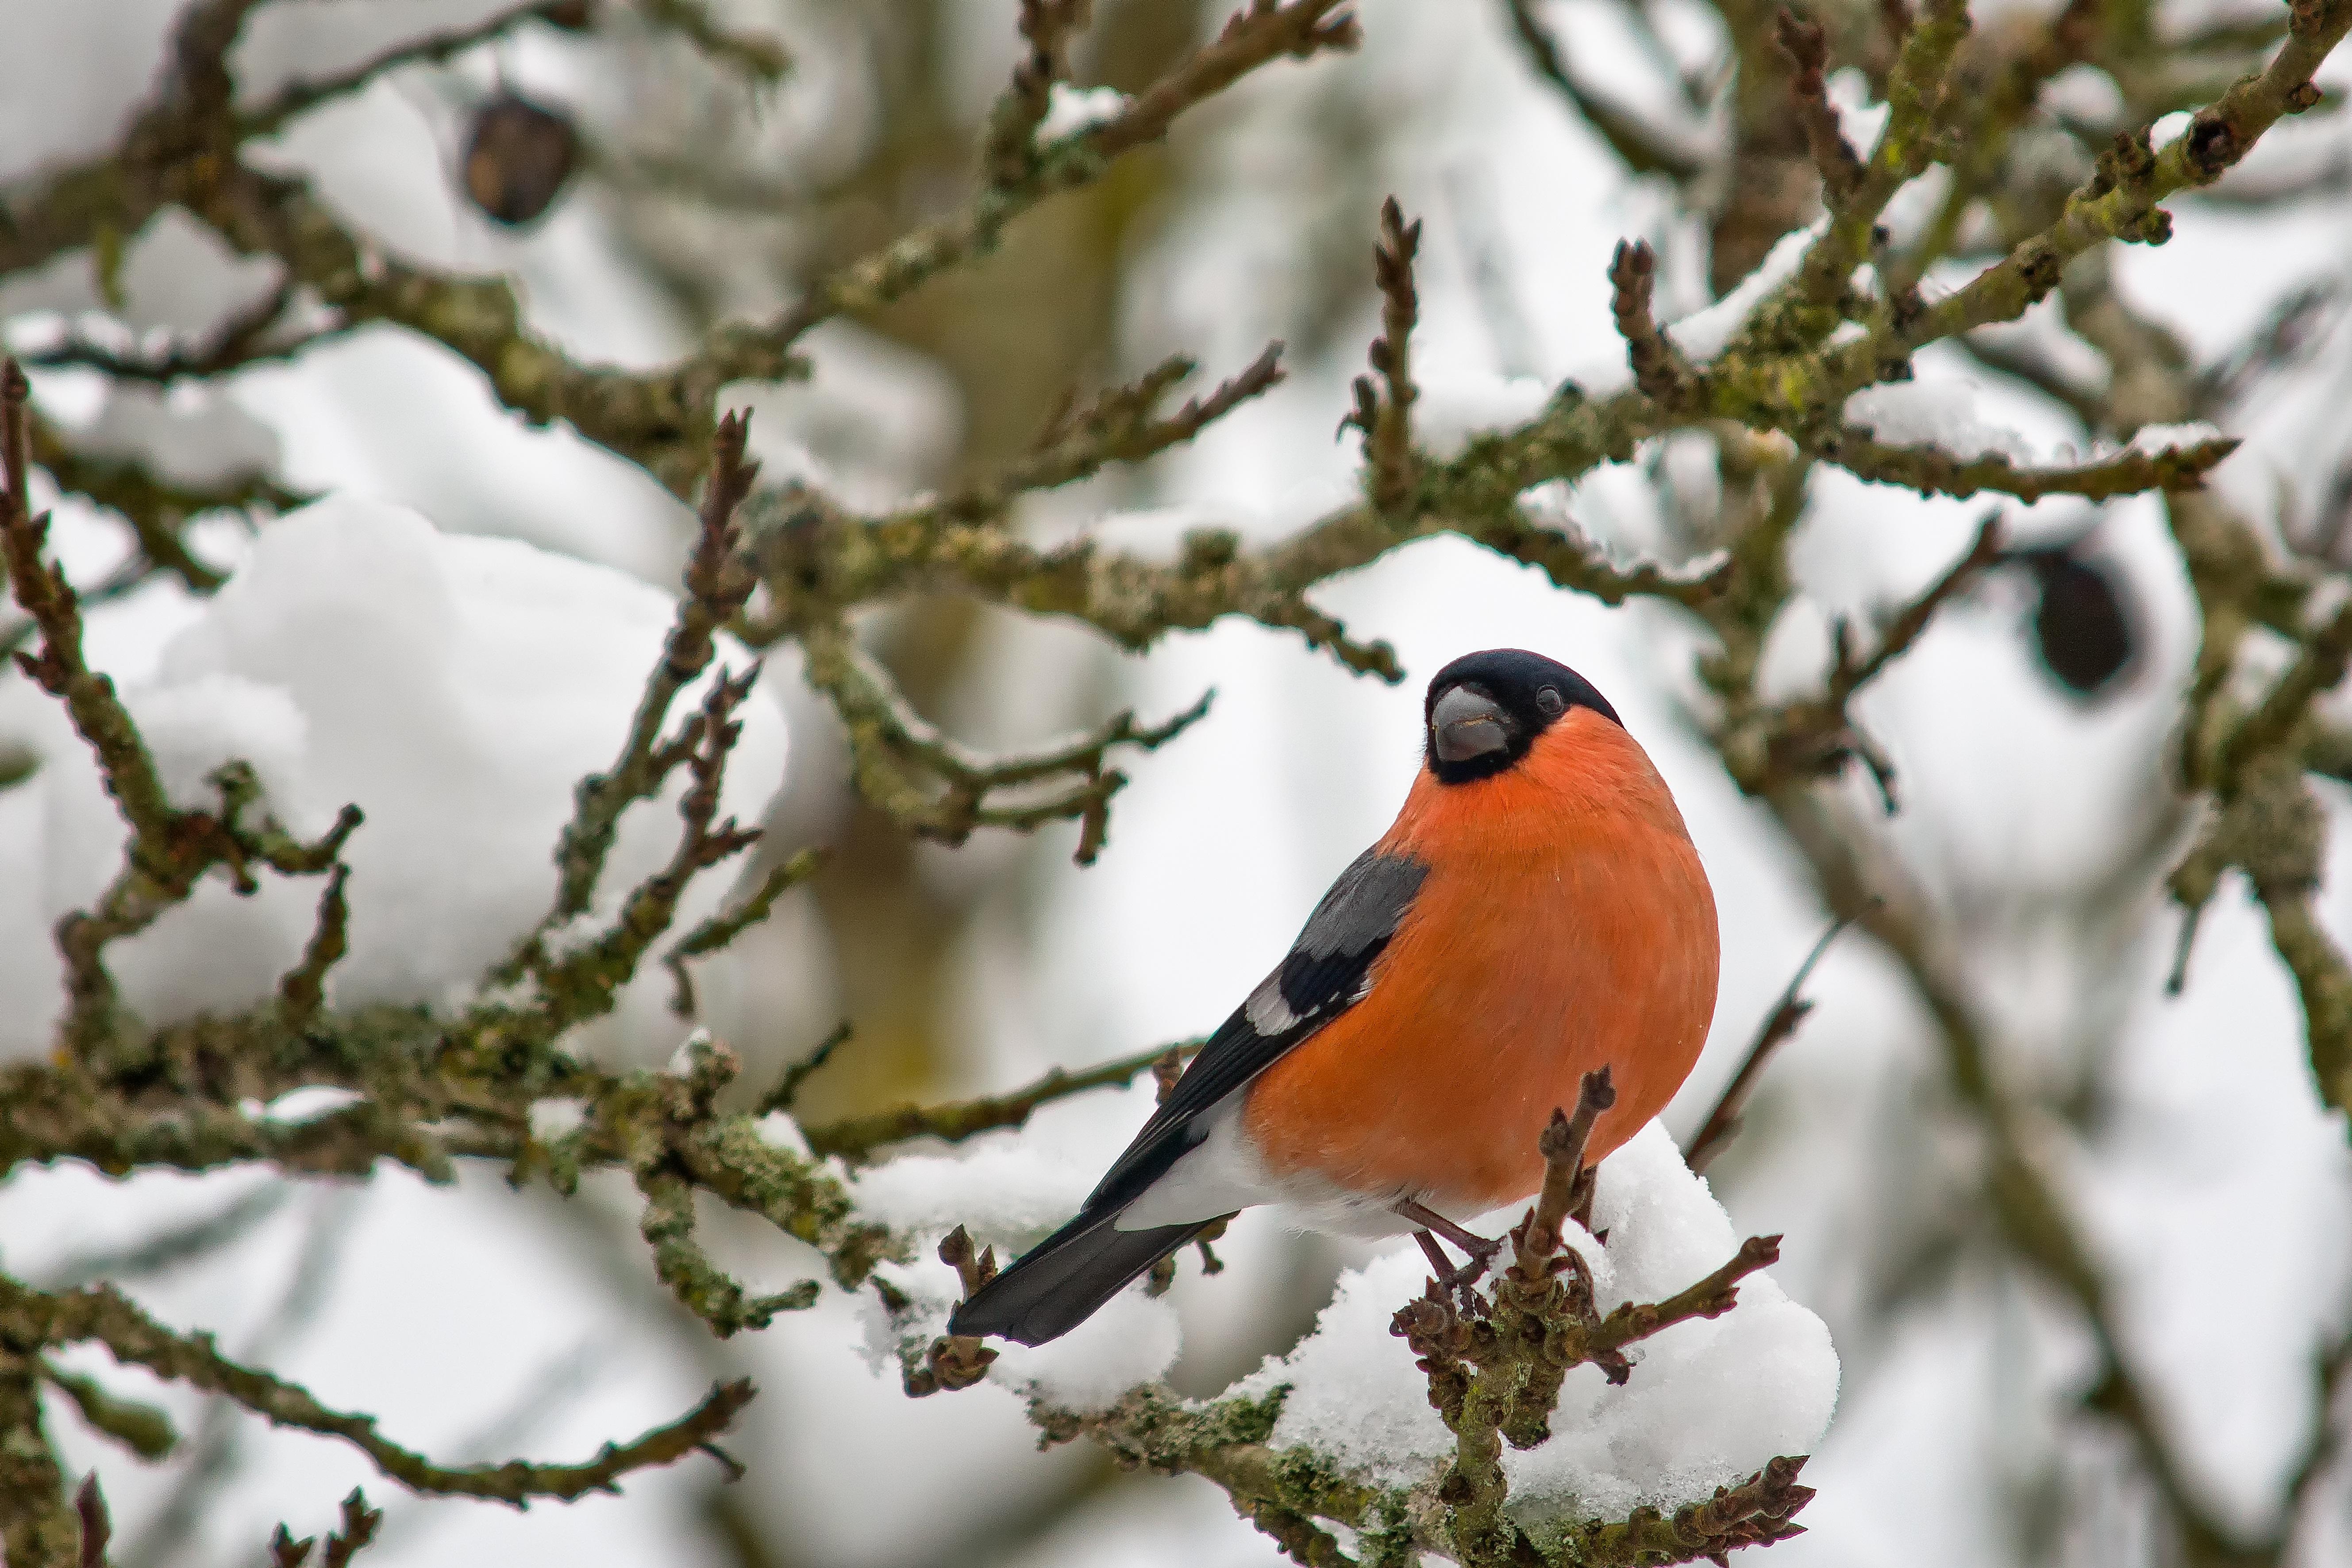 kostenlose foto baum natur ast schnee winter vogel blume tierwelt fr hling schnabel. Black Bedroom Furniture Sets. Home Design Ideas